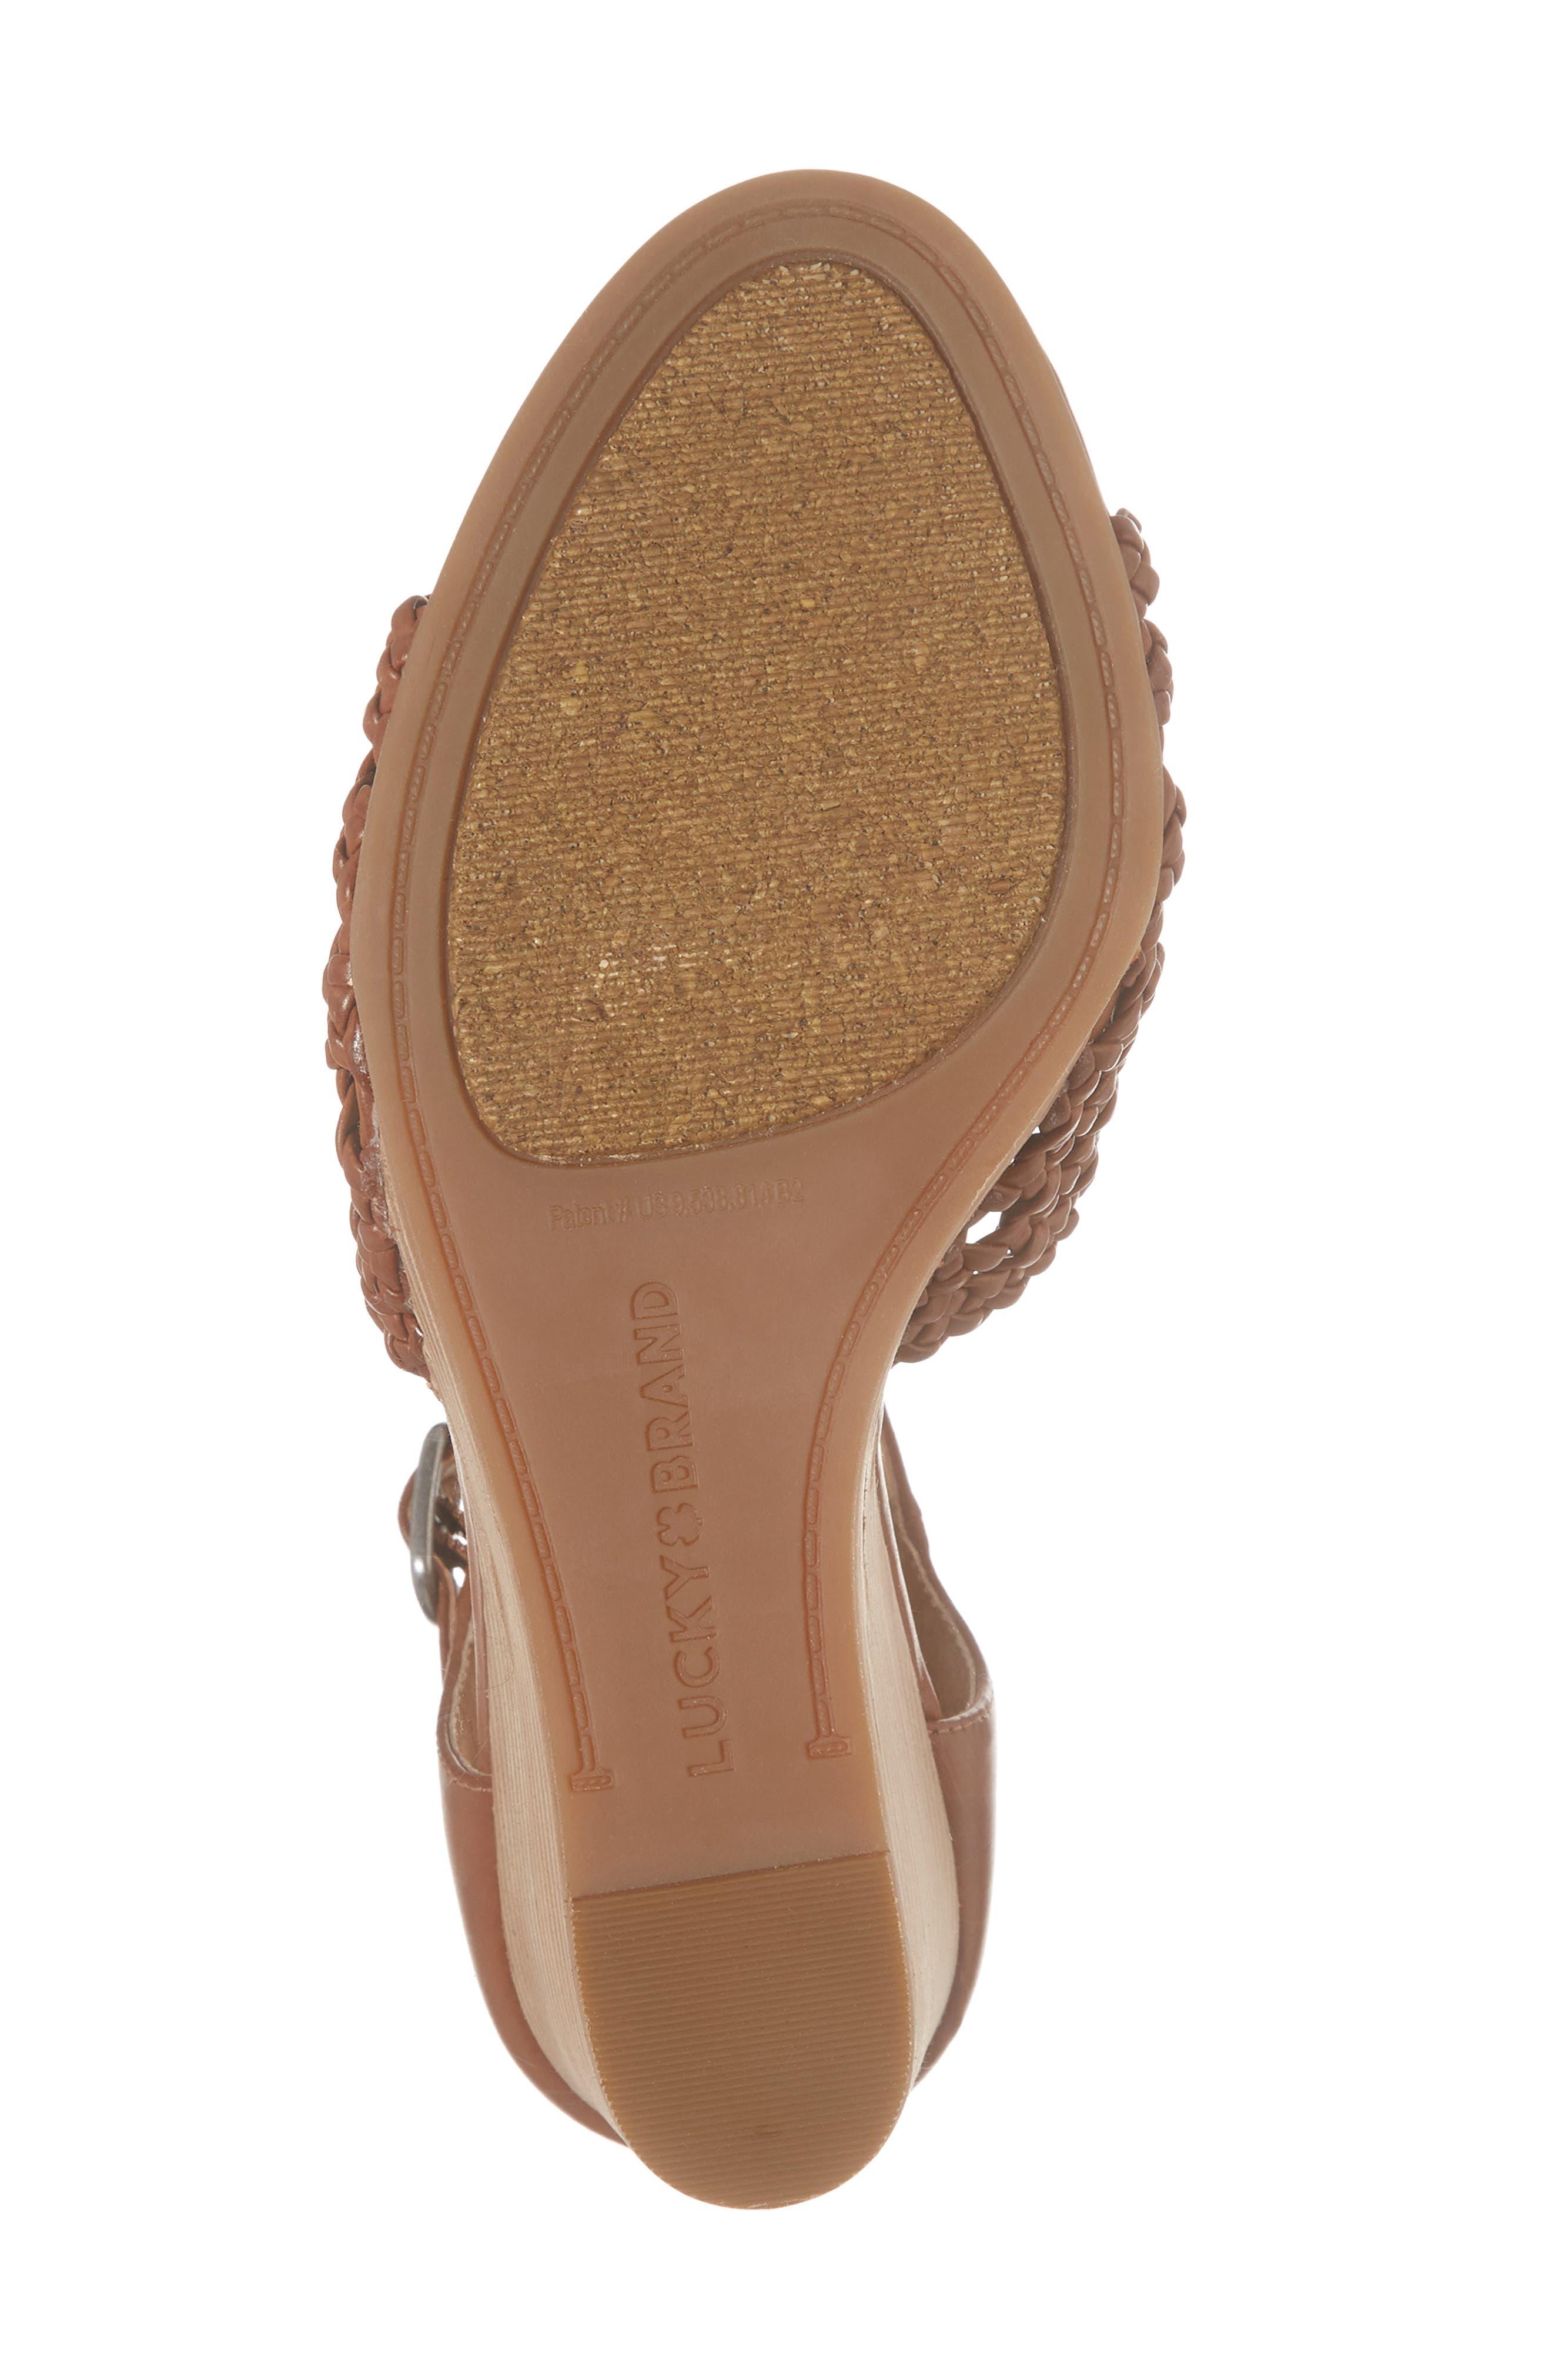 Rabekka Wedge Sandal,                             Alternate thumbnail 12, color,